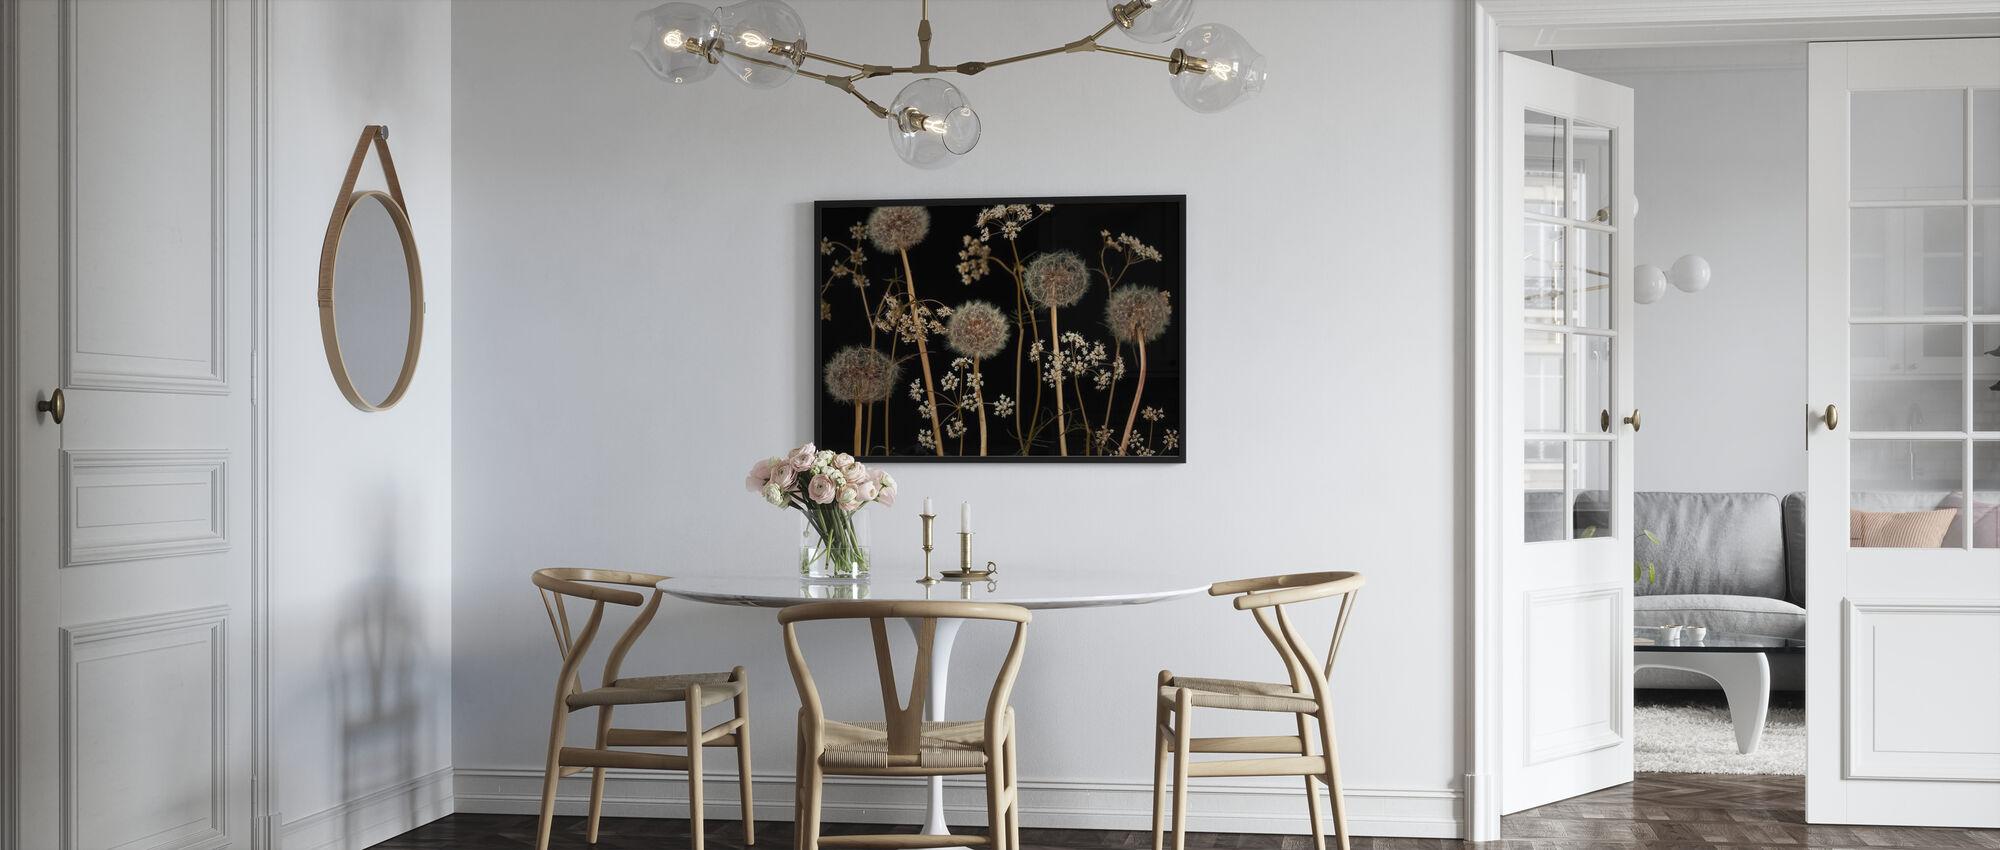 Wiesenblumen - Dunkelbraun - Poster - Küchen